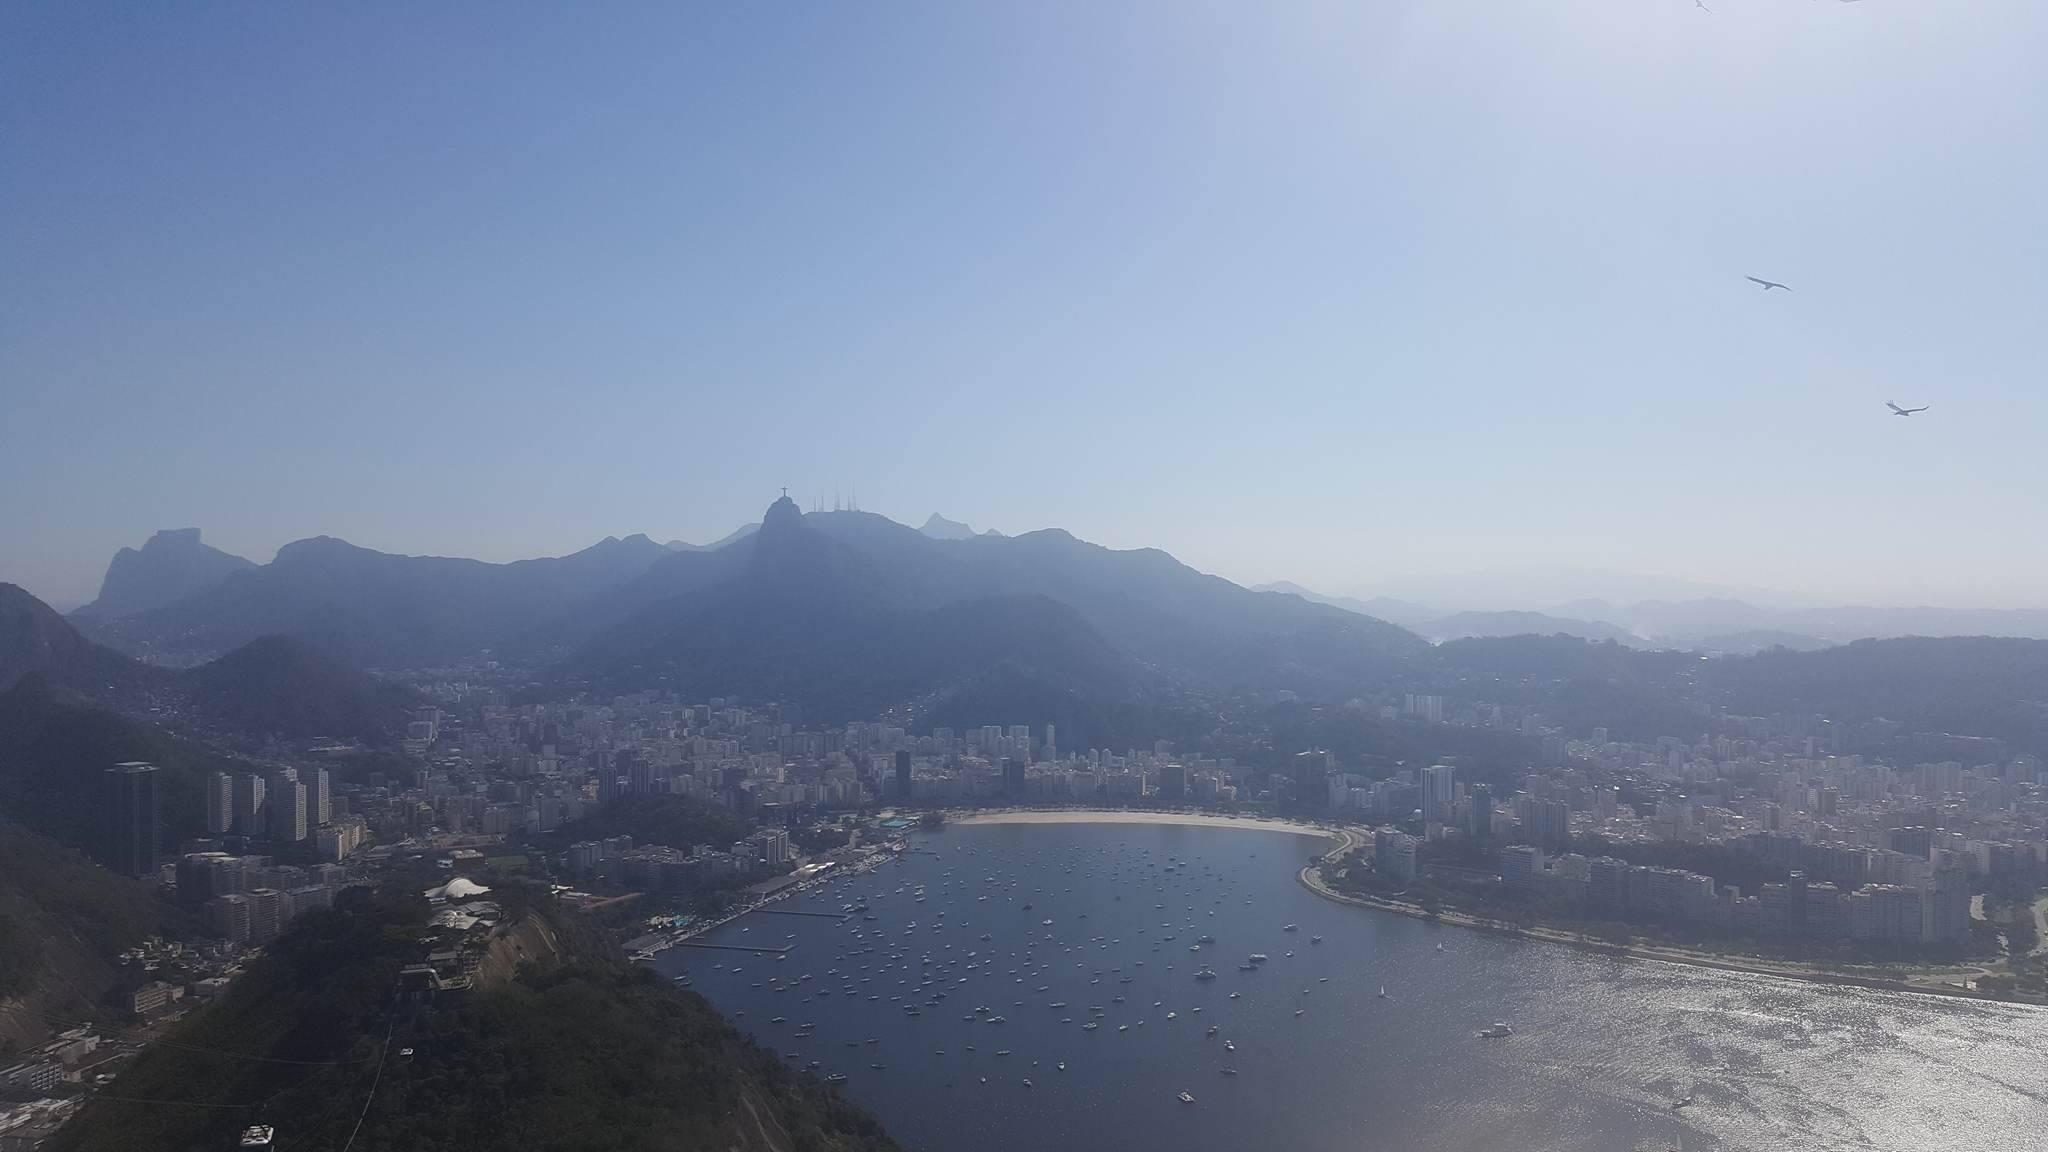 View from Sugar Loaf Mountain Rio de Janeiro